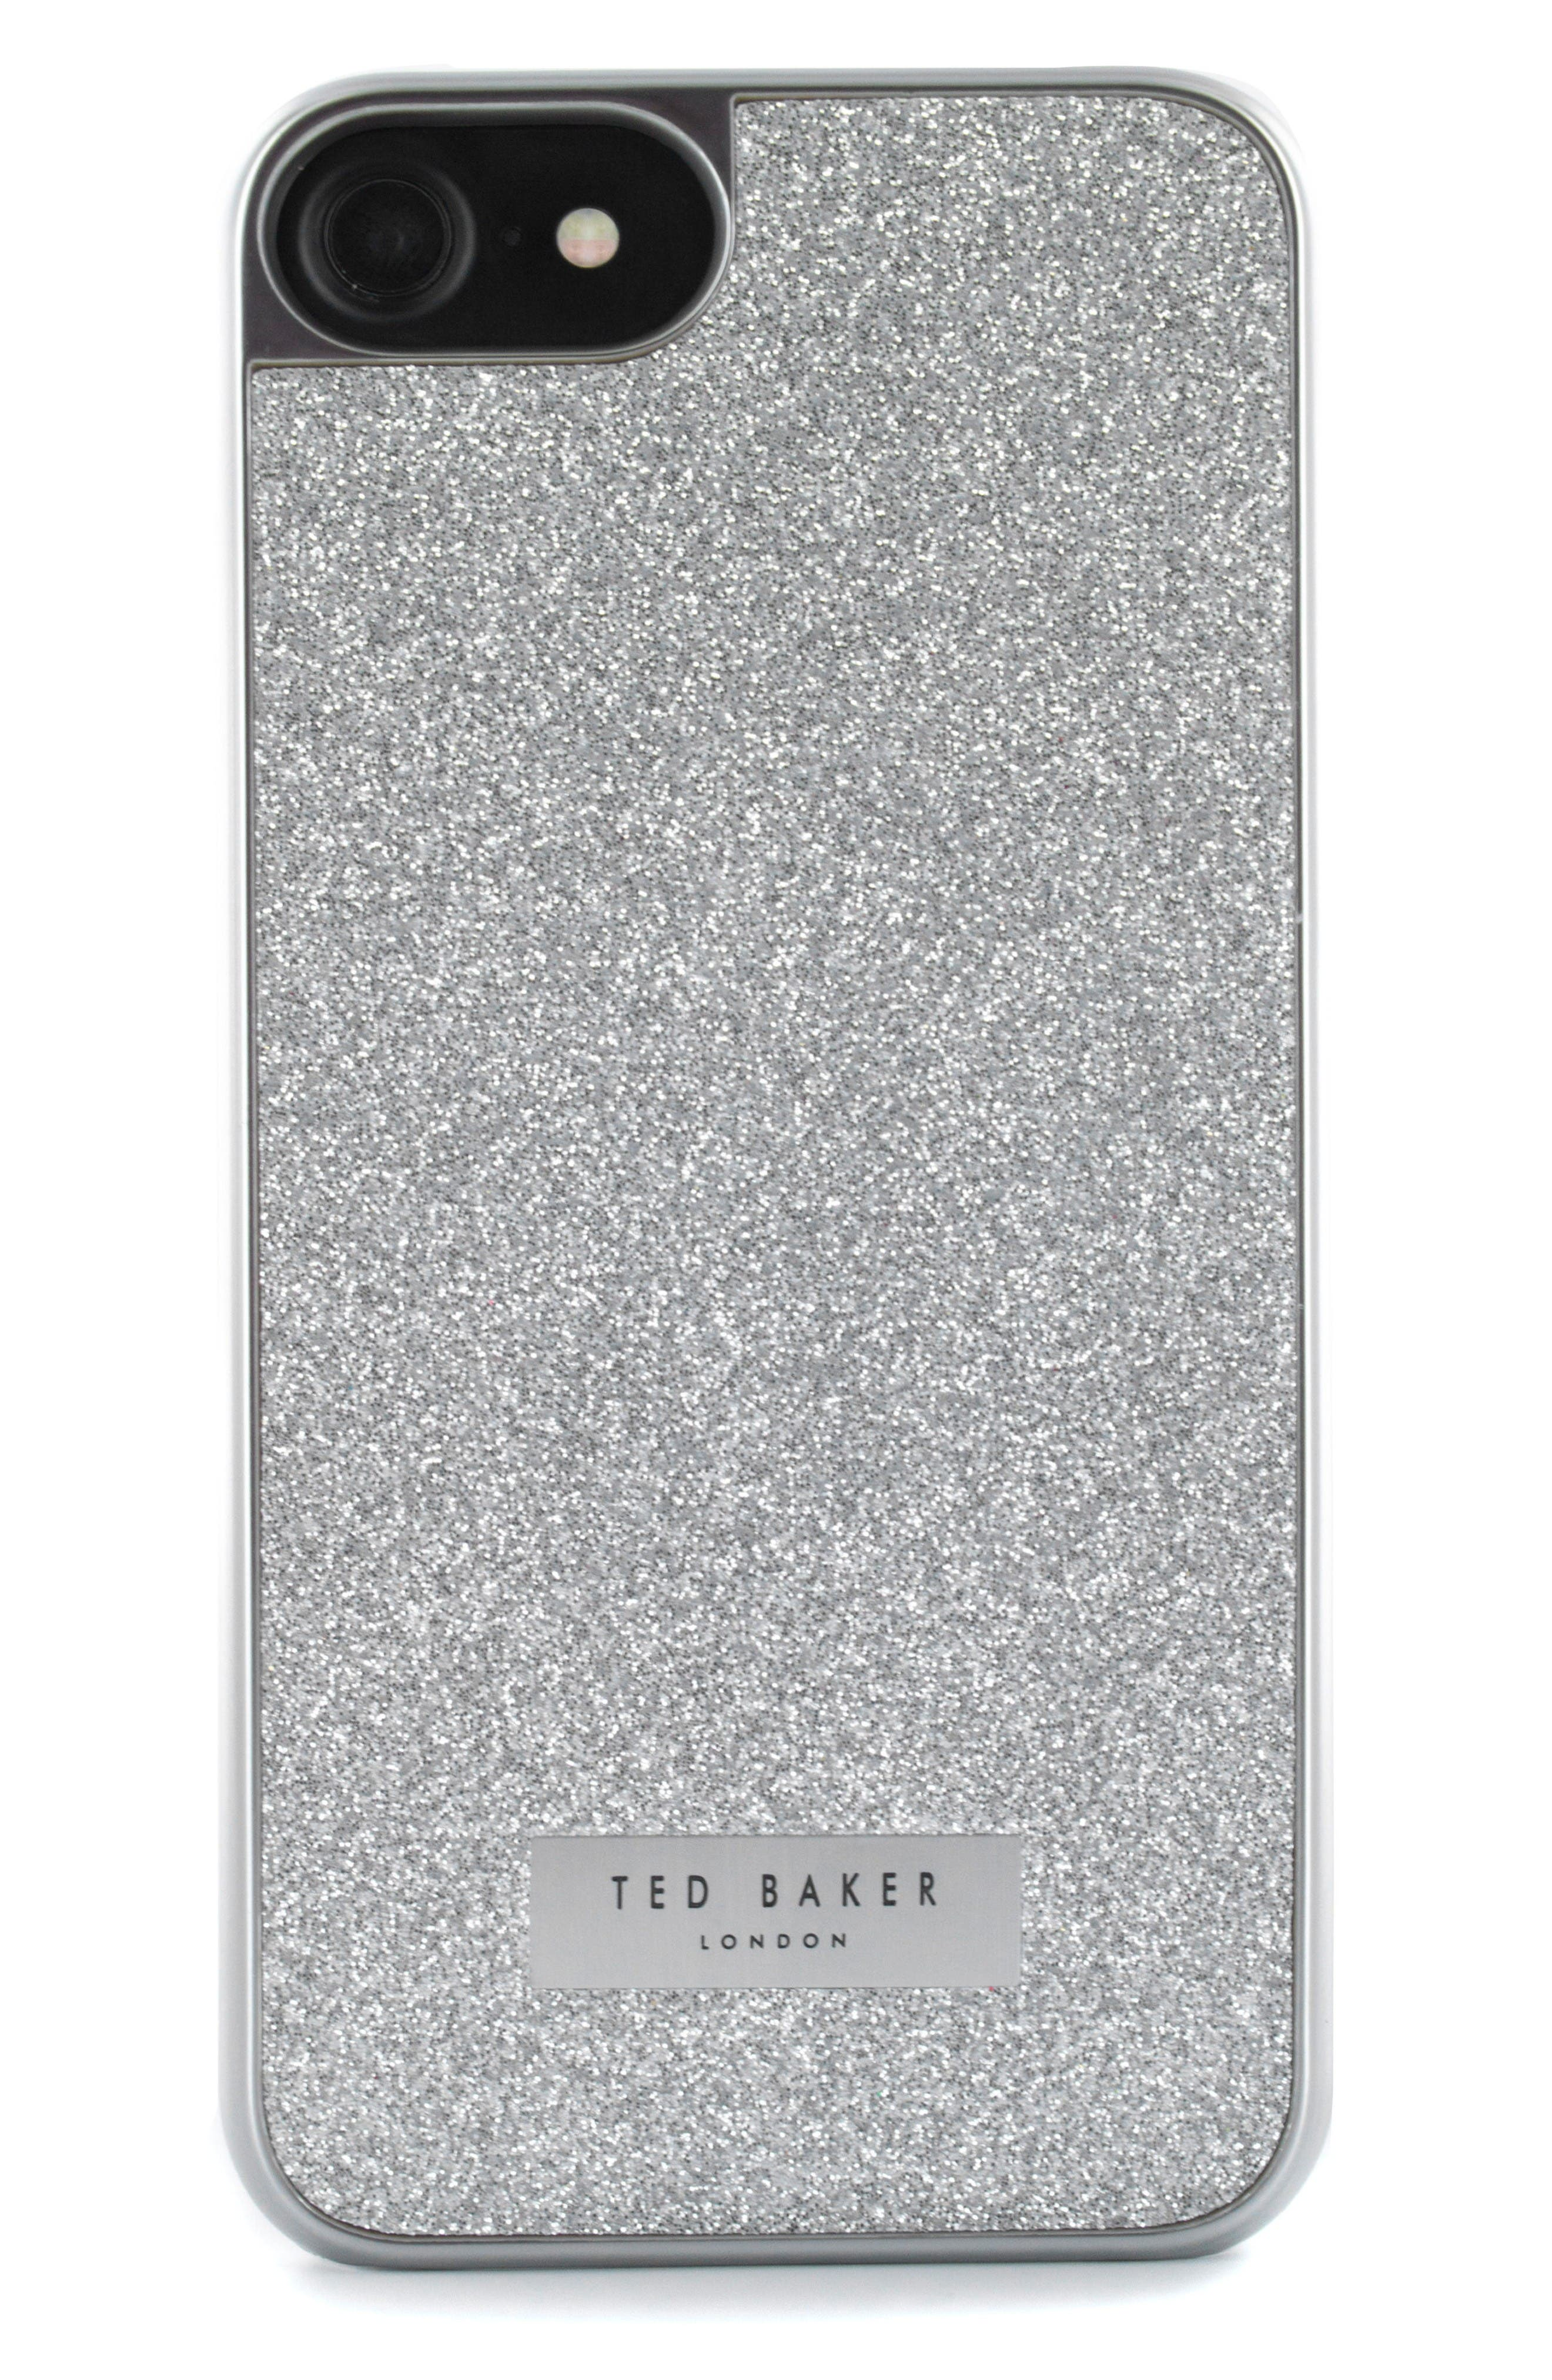 Ted Baker London Sparkles iPhone 7 & 7 Plus Case